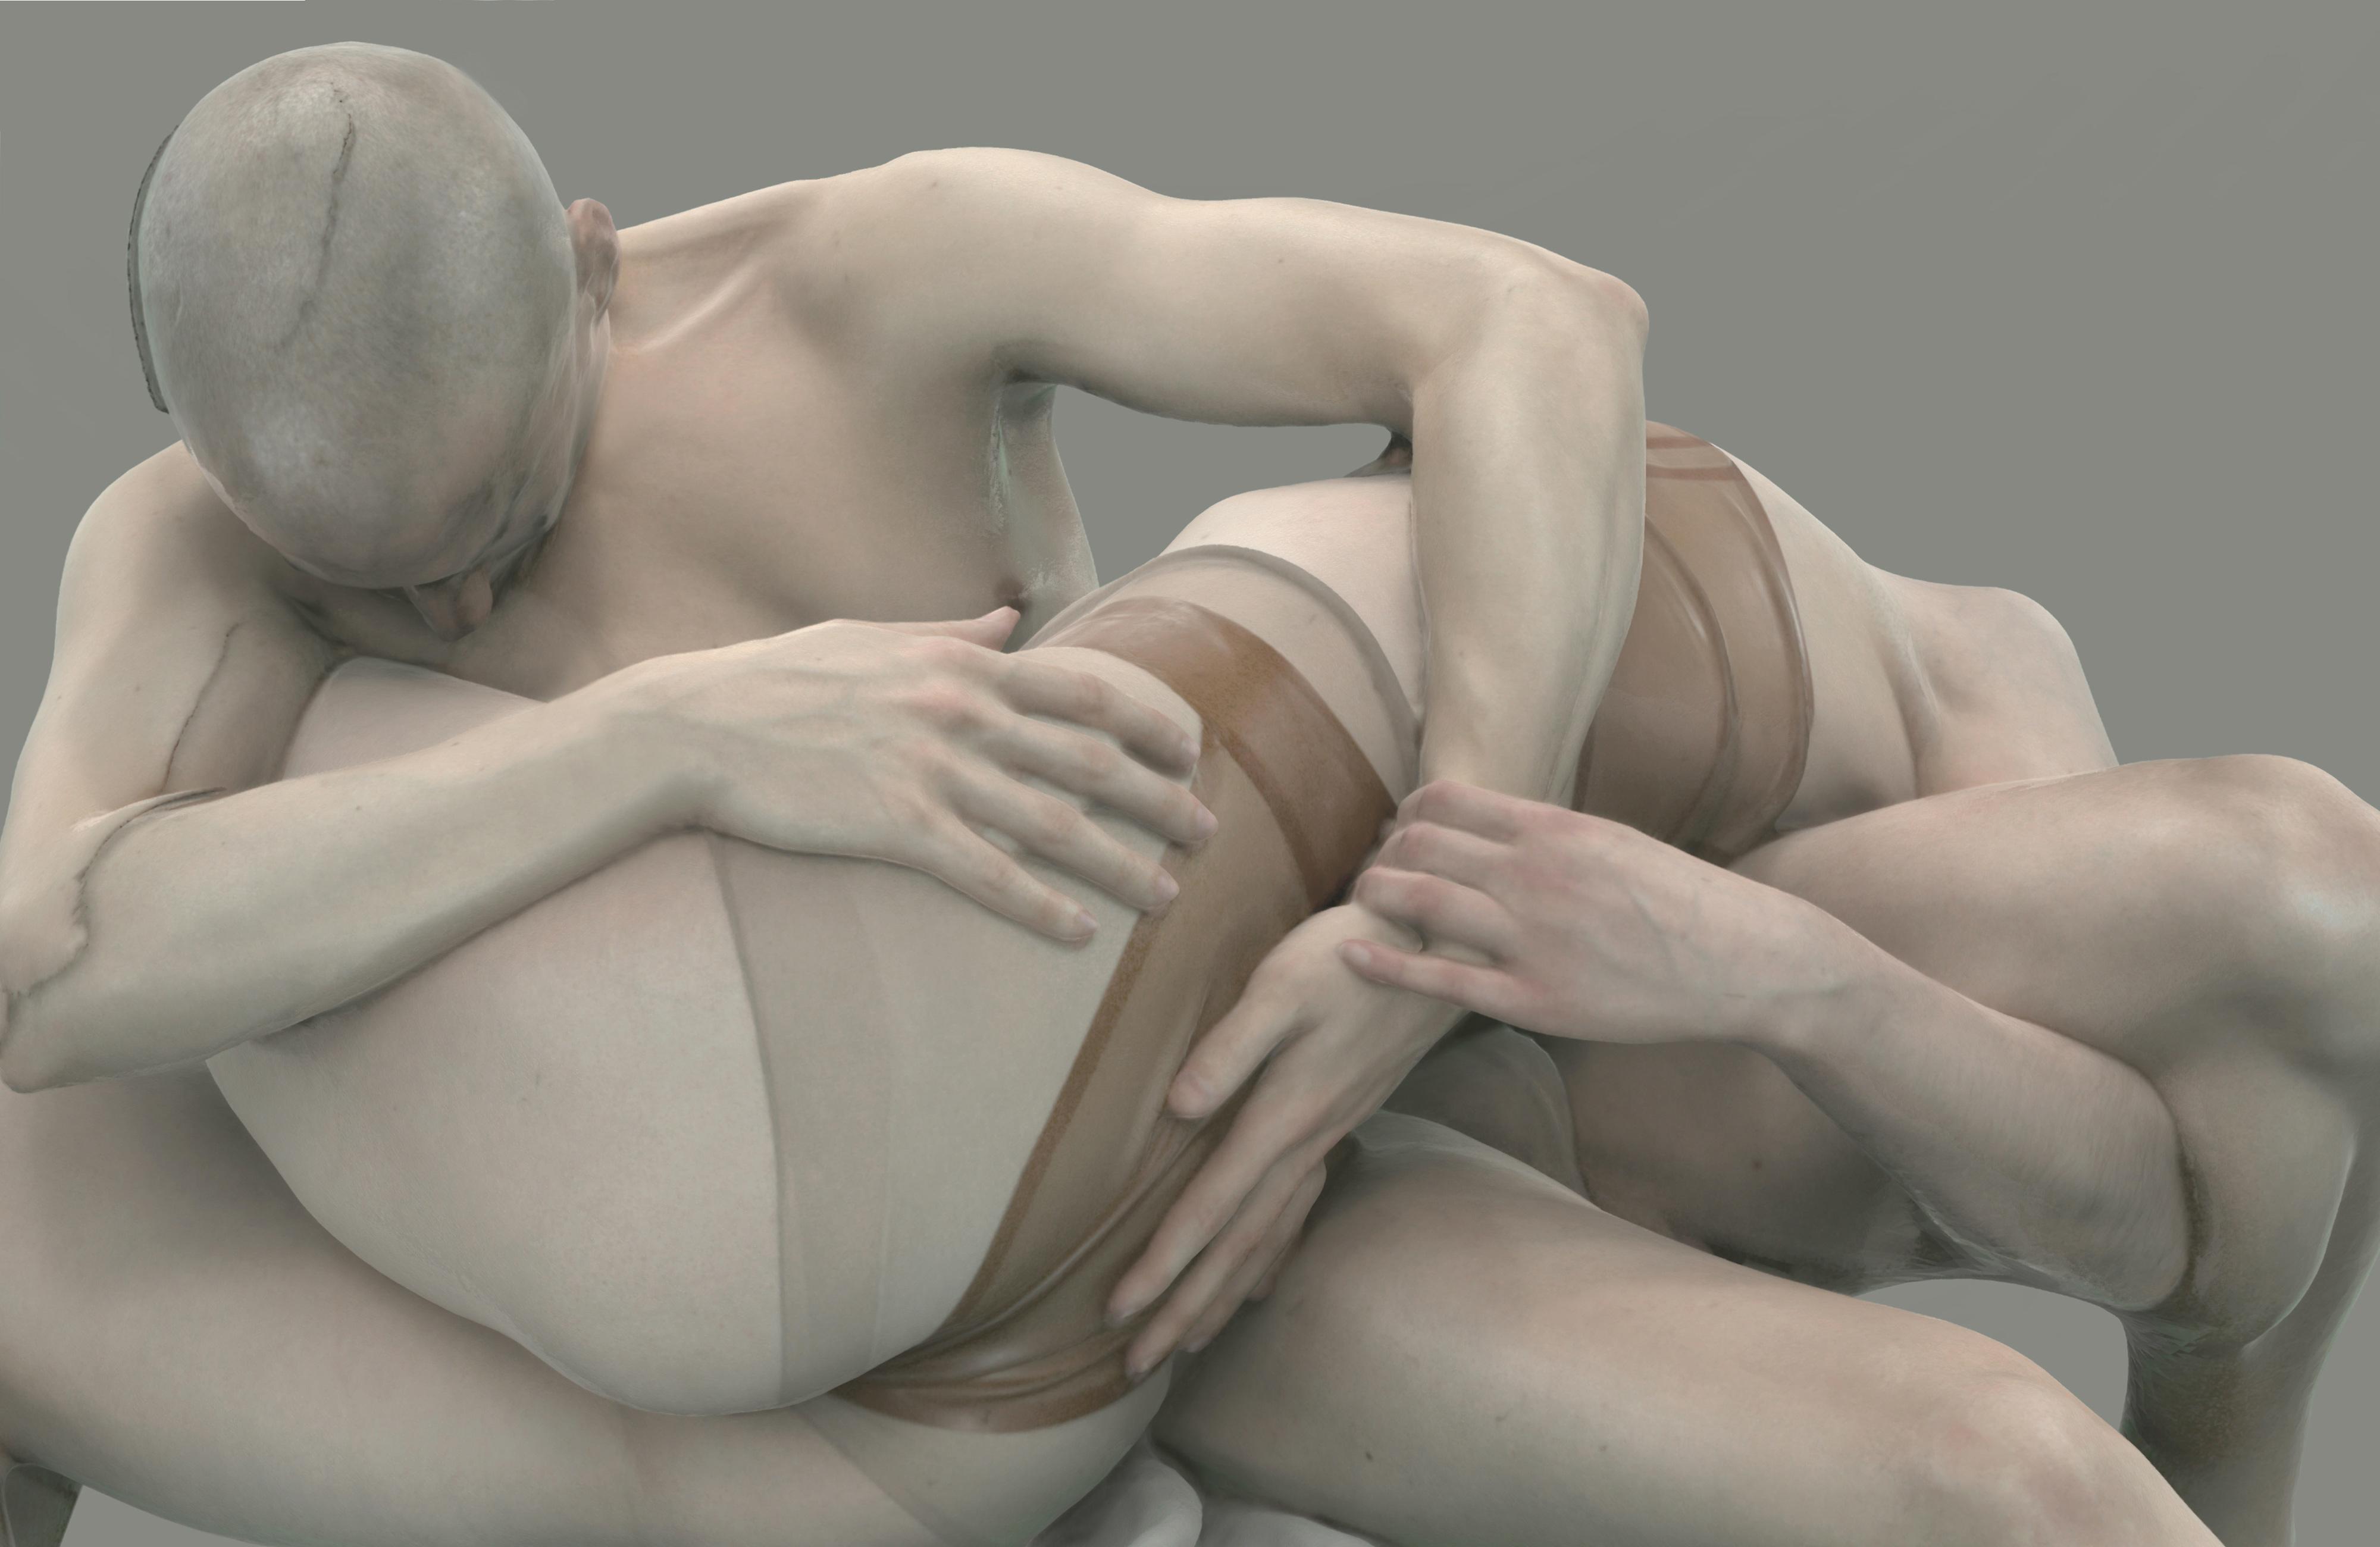 Galerie Barbara Thumm \ New Viewings #20 \ New Viewings #20